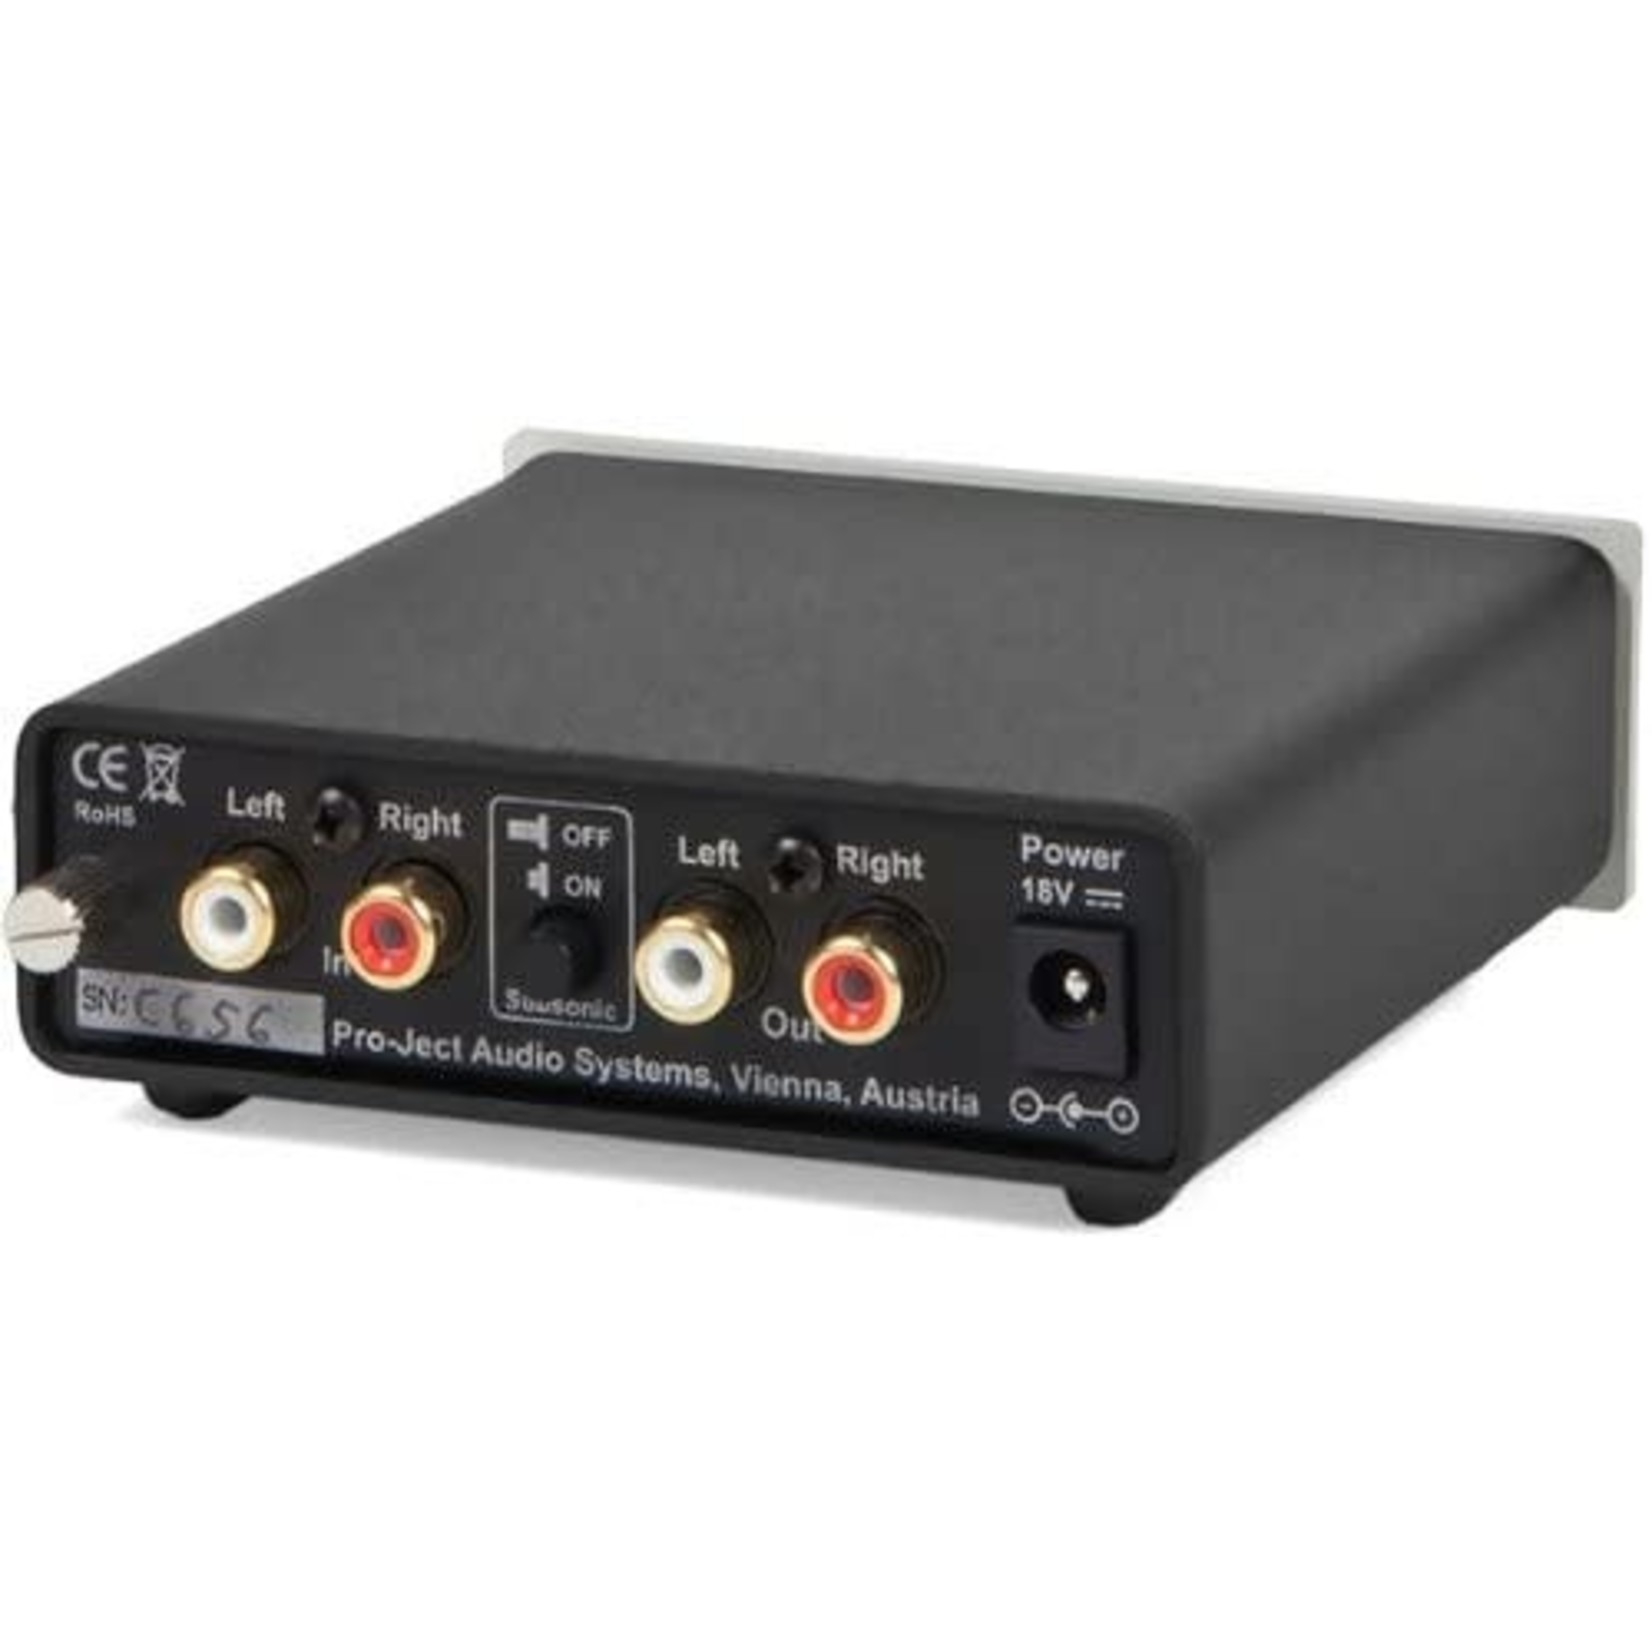 Accessory Pro-ject Premium Phono Box MM/MC